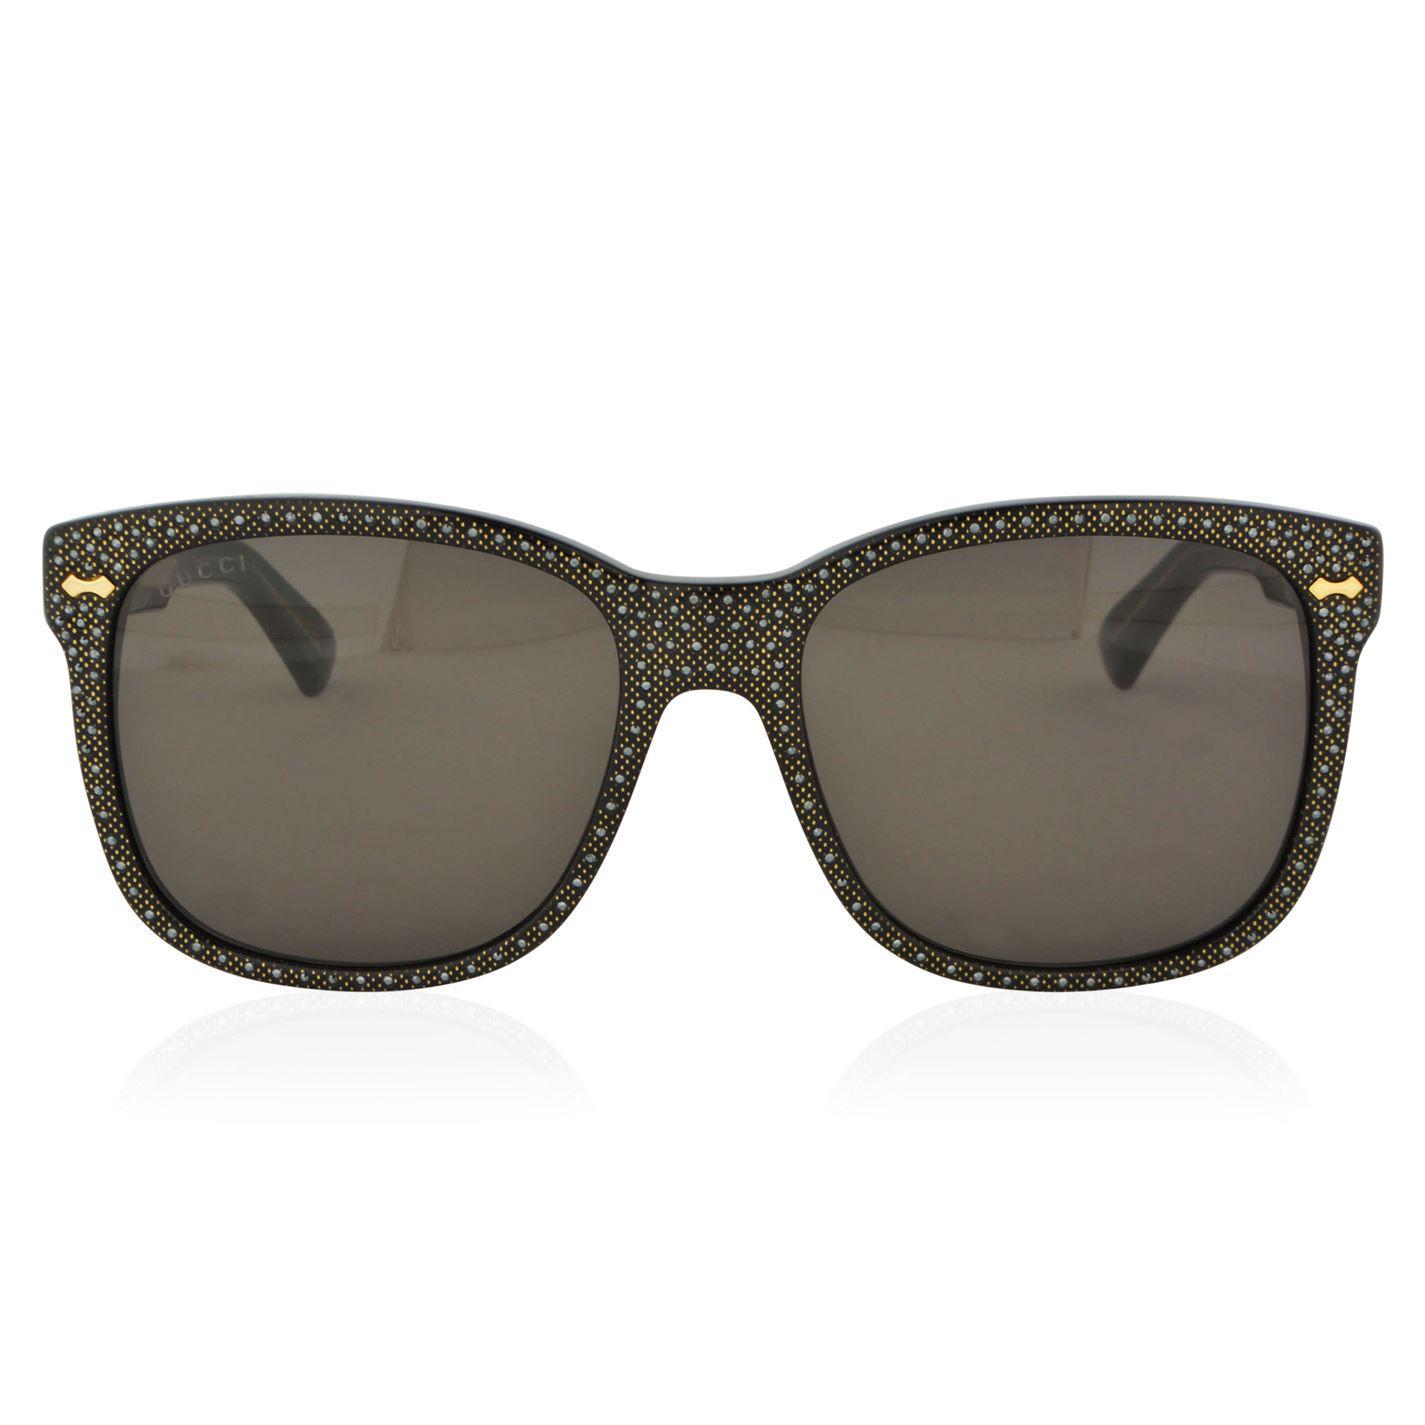 b69a5cc5cfa Gucci Gg0047s Square Frame Rhinestone Sunglasses in Black - Lyst